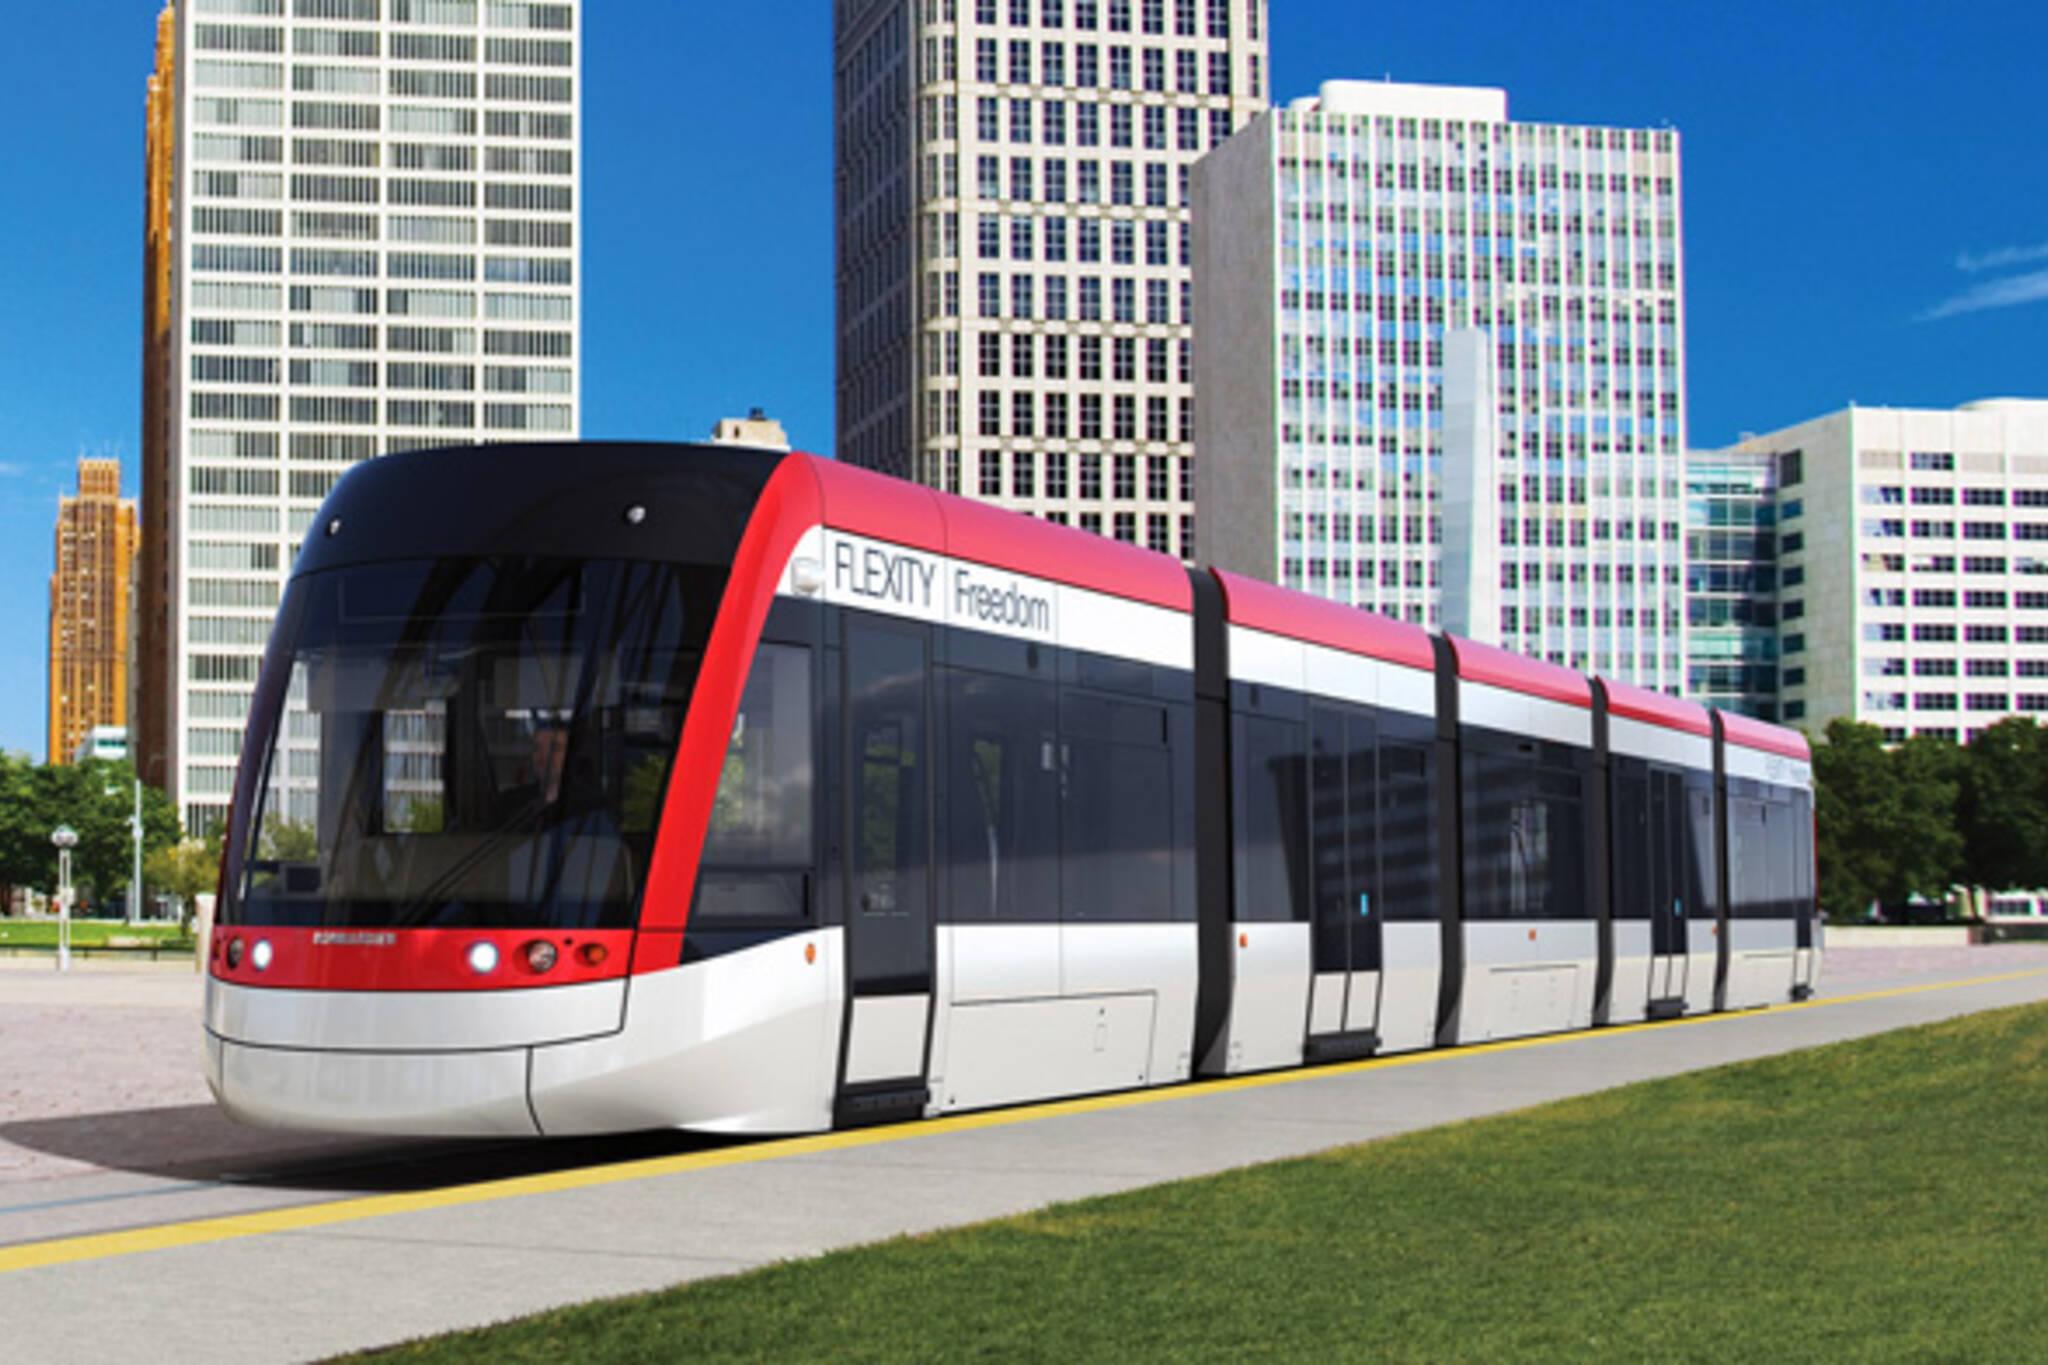 Sheppard LRT Toronto